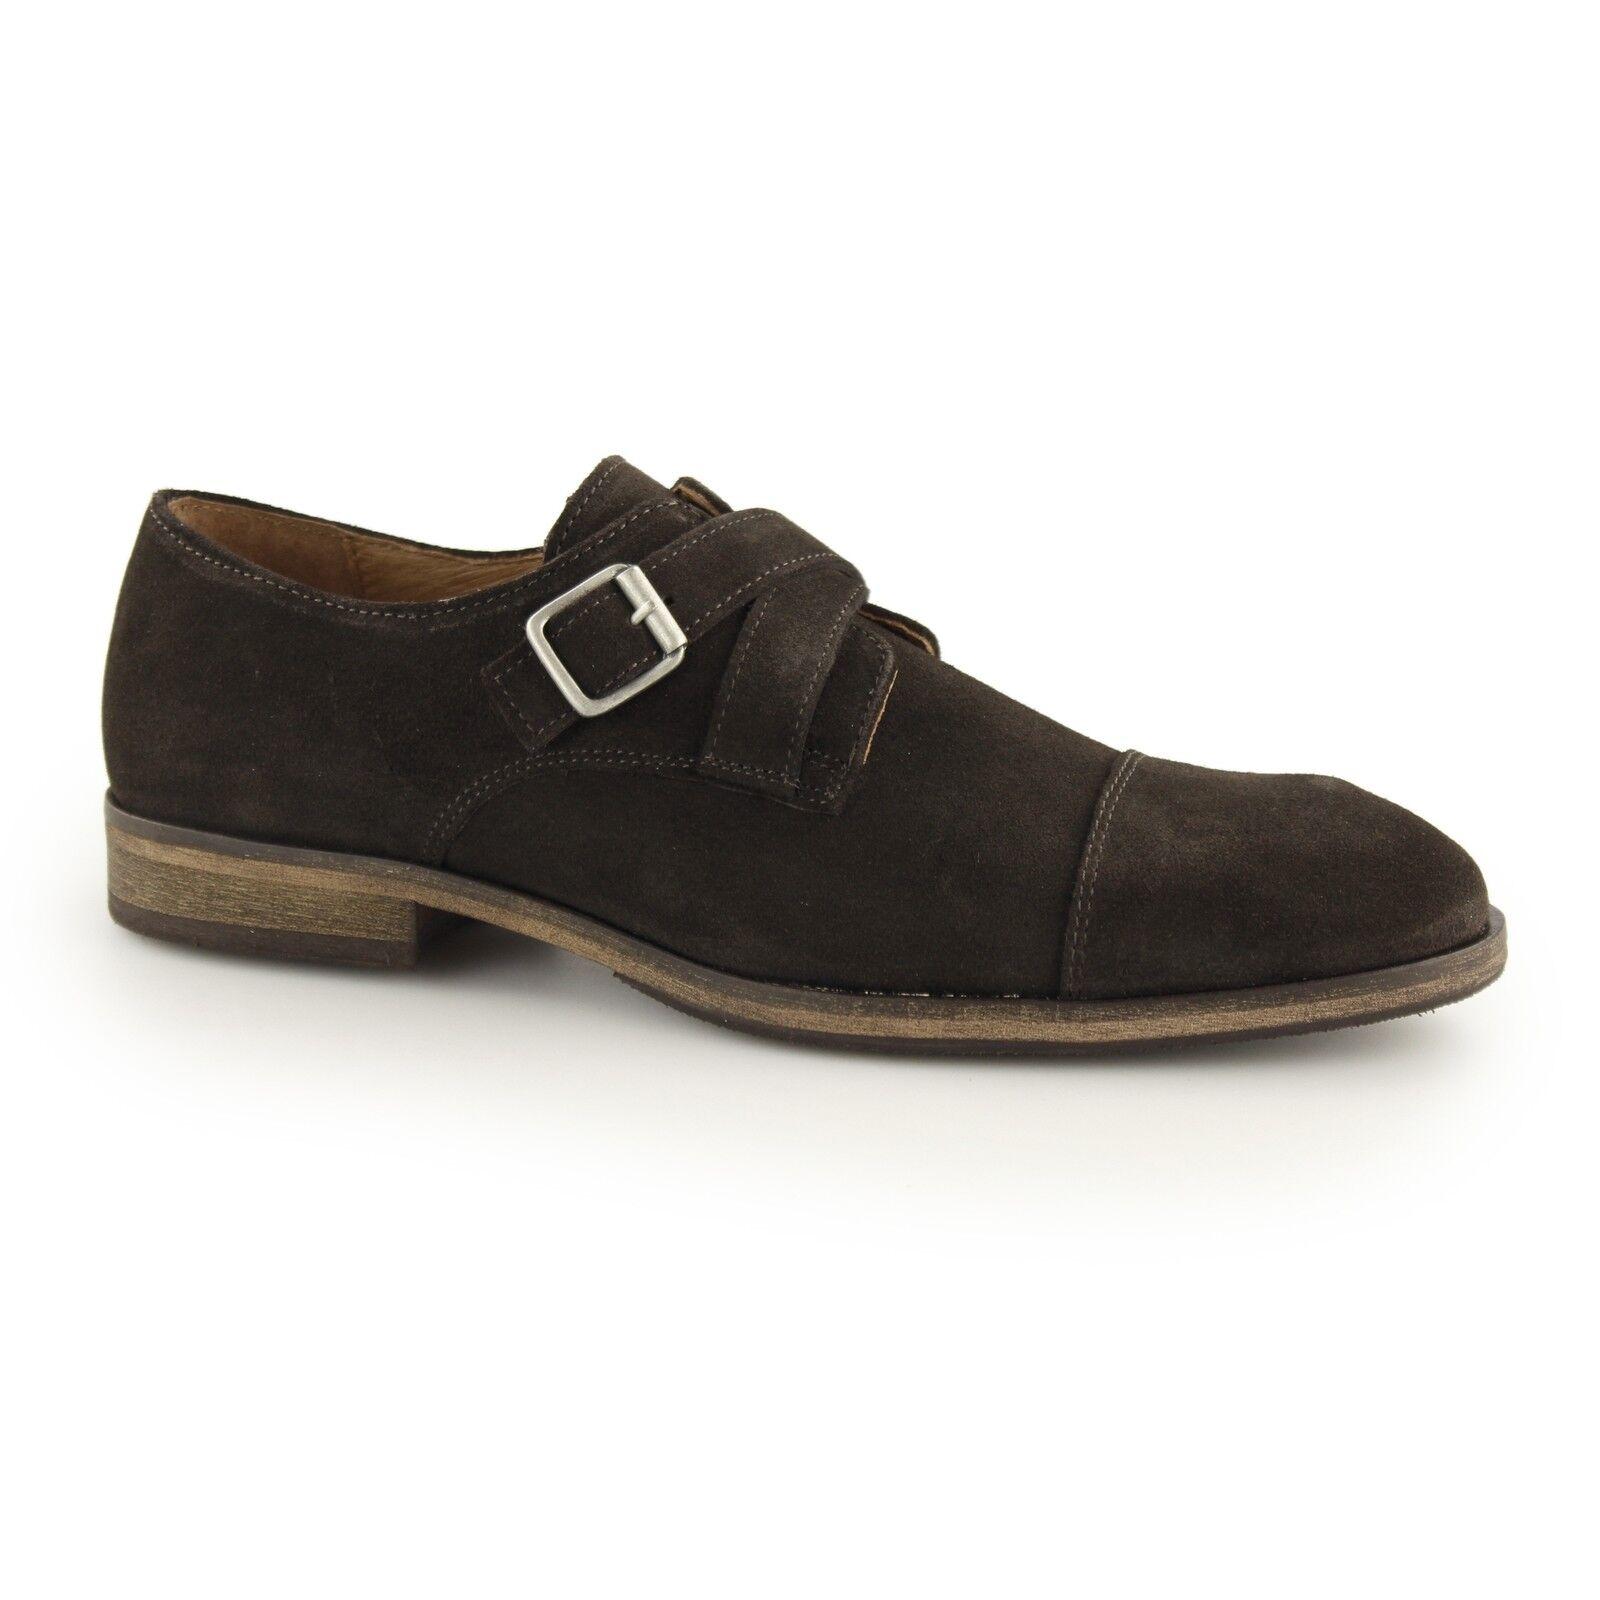 Selected BOLTON Mens Suede Toecap Formal Evening Smart Monkstrap shoes Brown